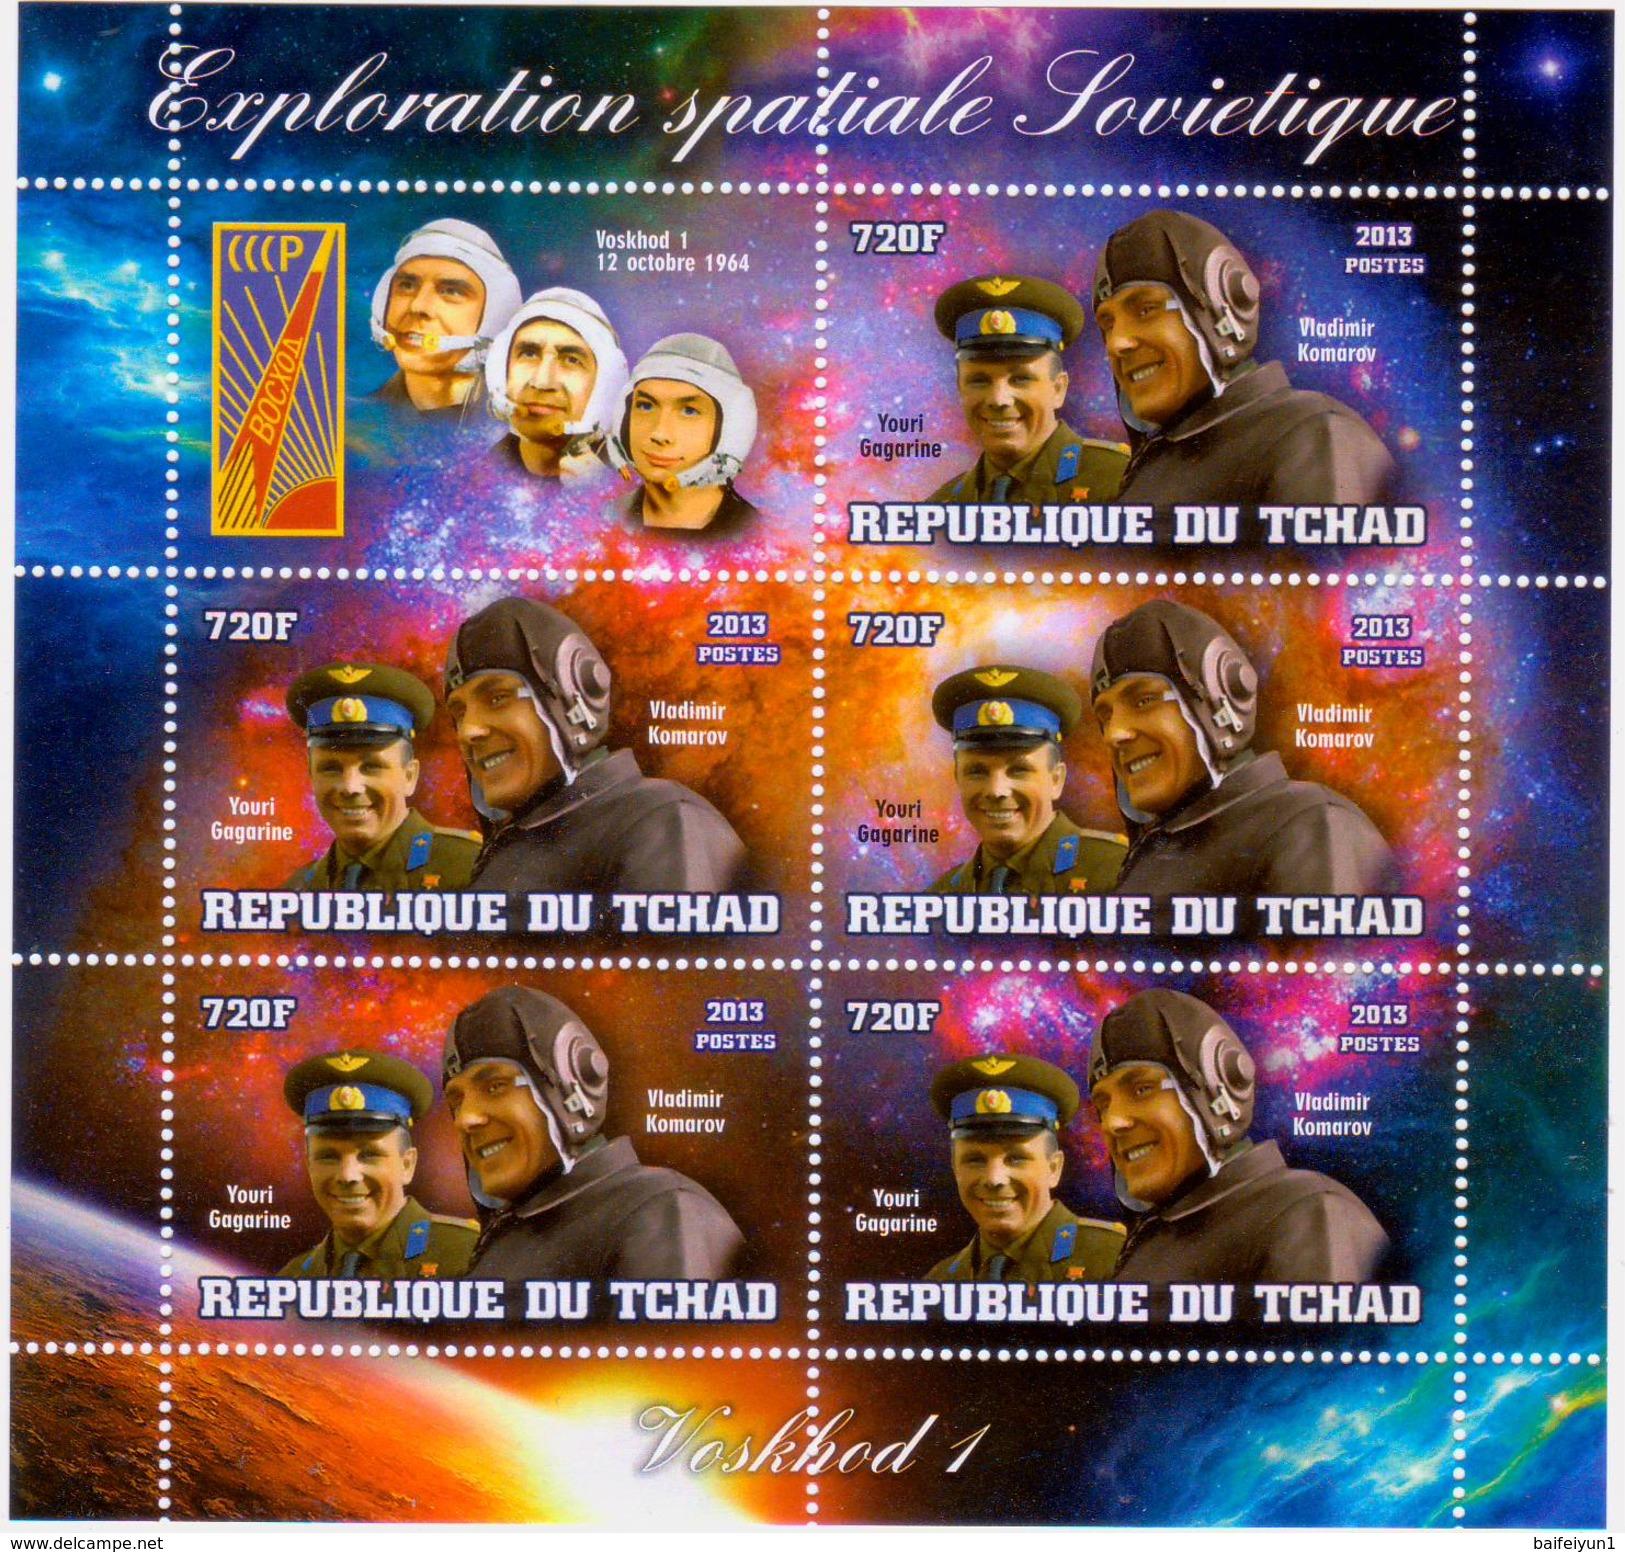 Chad 2013 Stamps Voskhod-1  Spacecraft Spaceman Yuri Gagarine And Vladimir Komarov  Two MS - Space